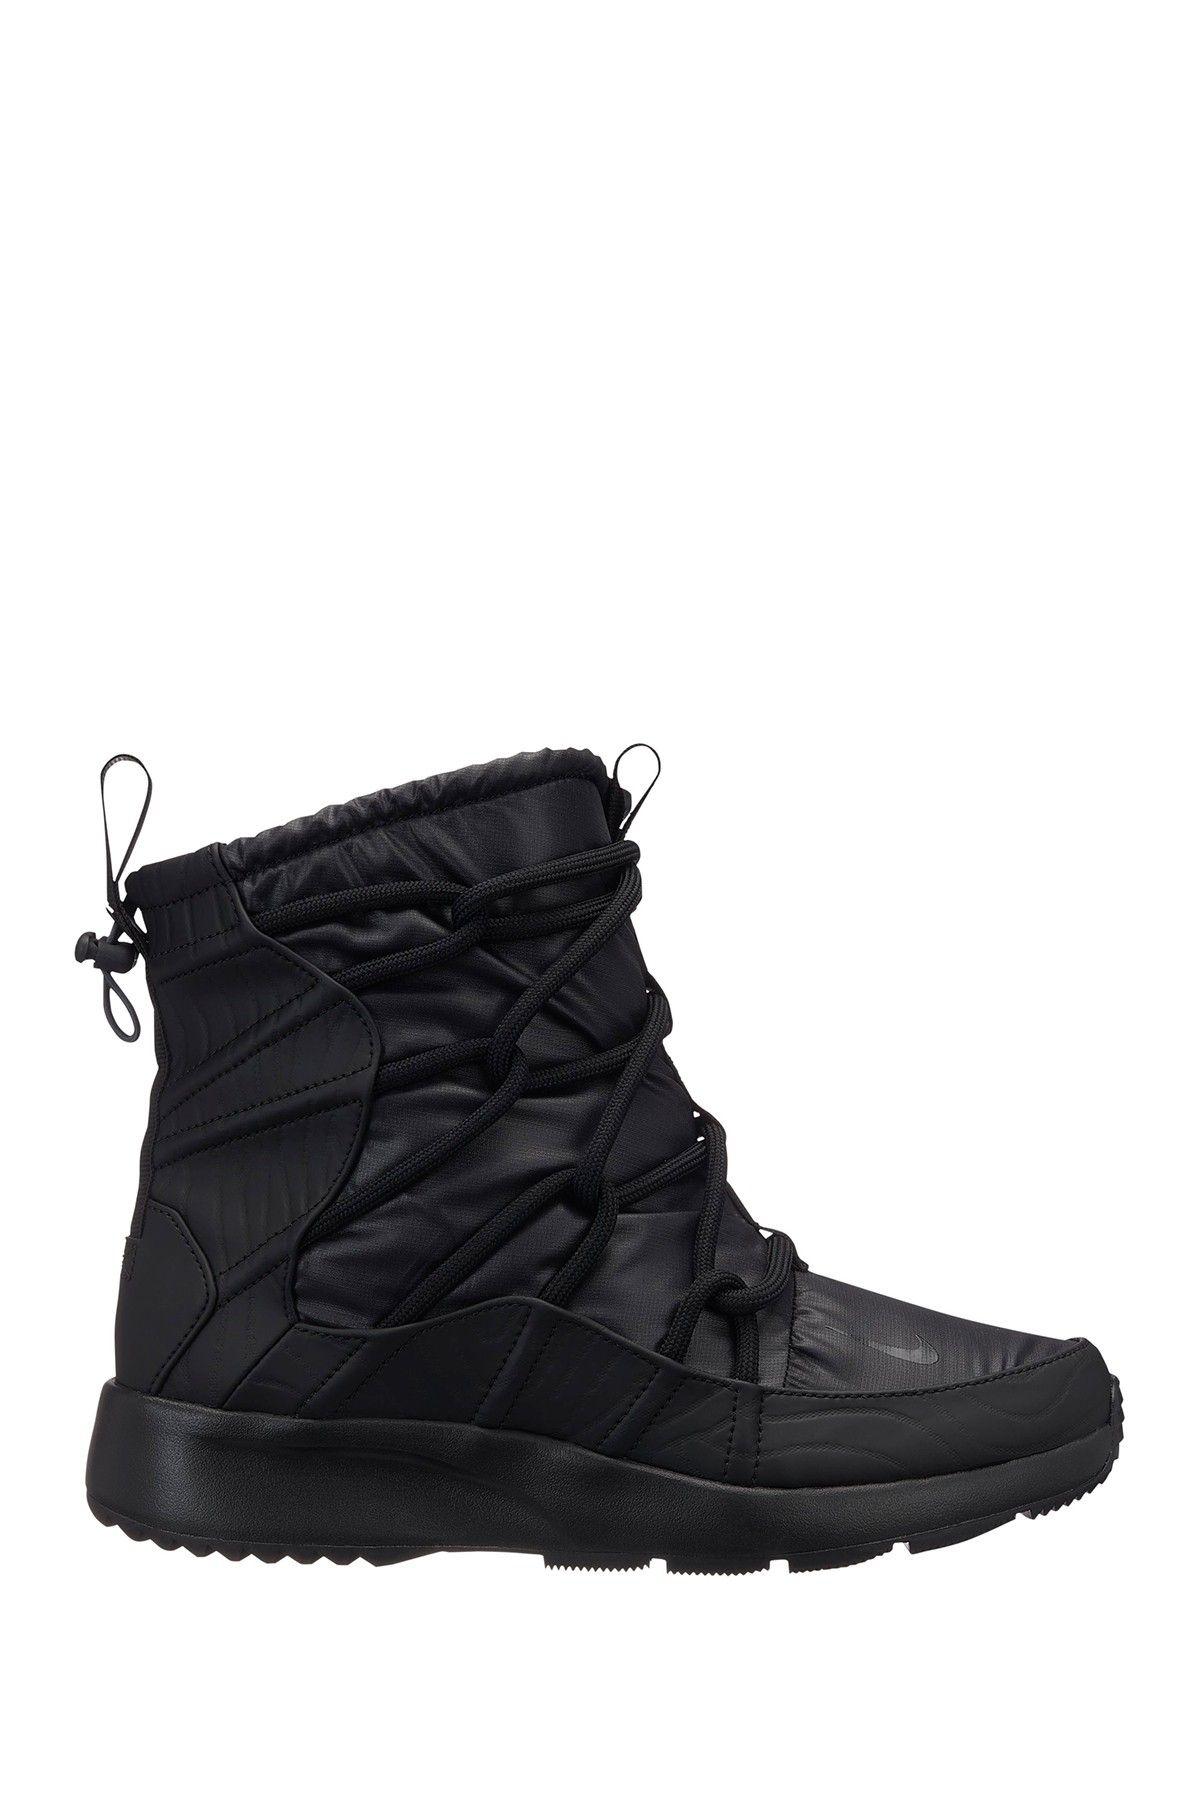 Nike Tanjun High Rise Shoe by Nike on  nordstrom rack 28d036fb0